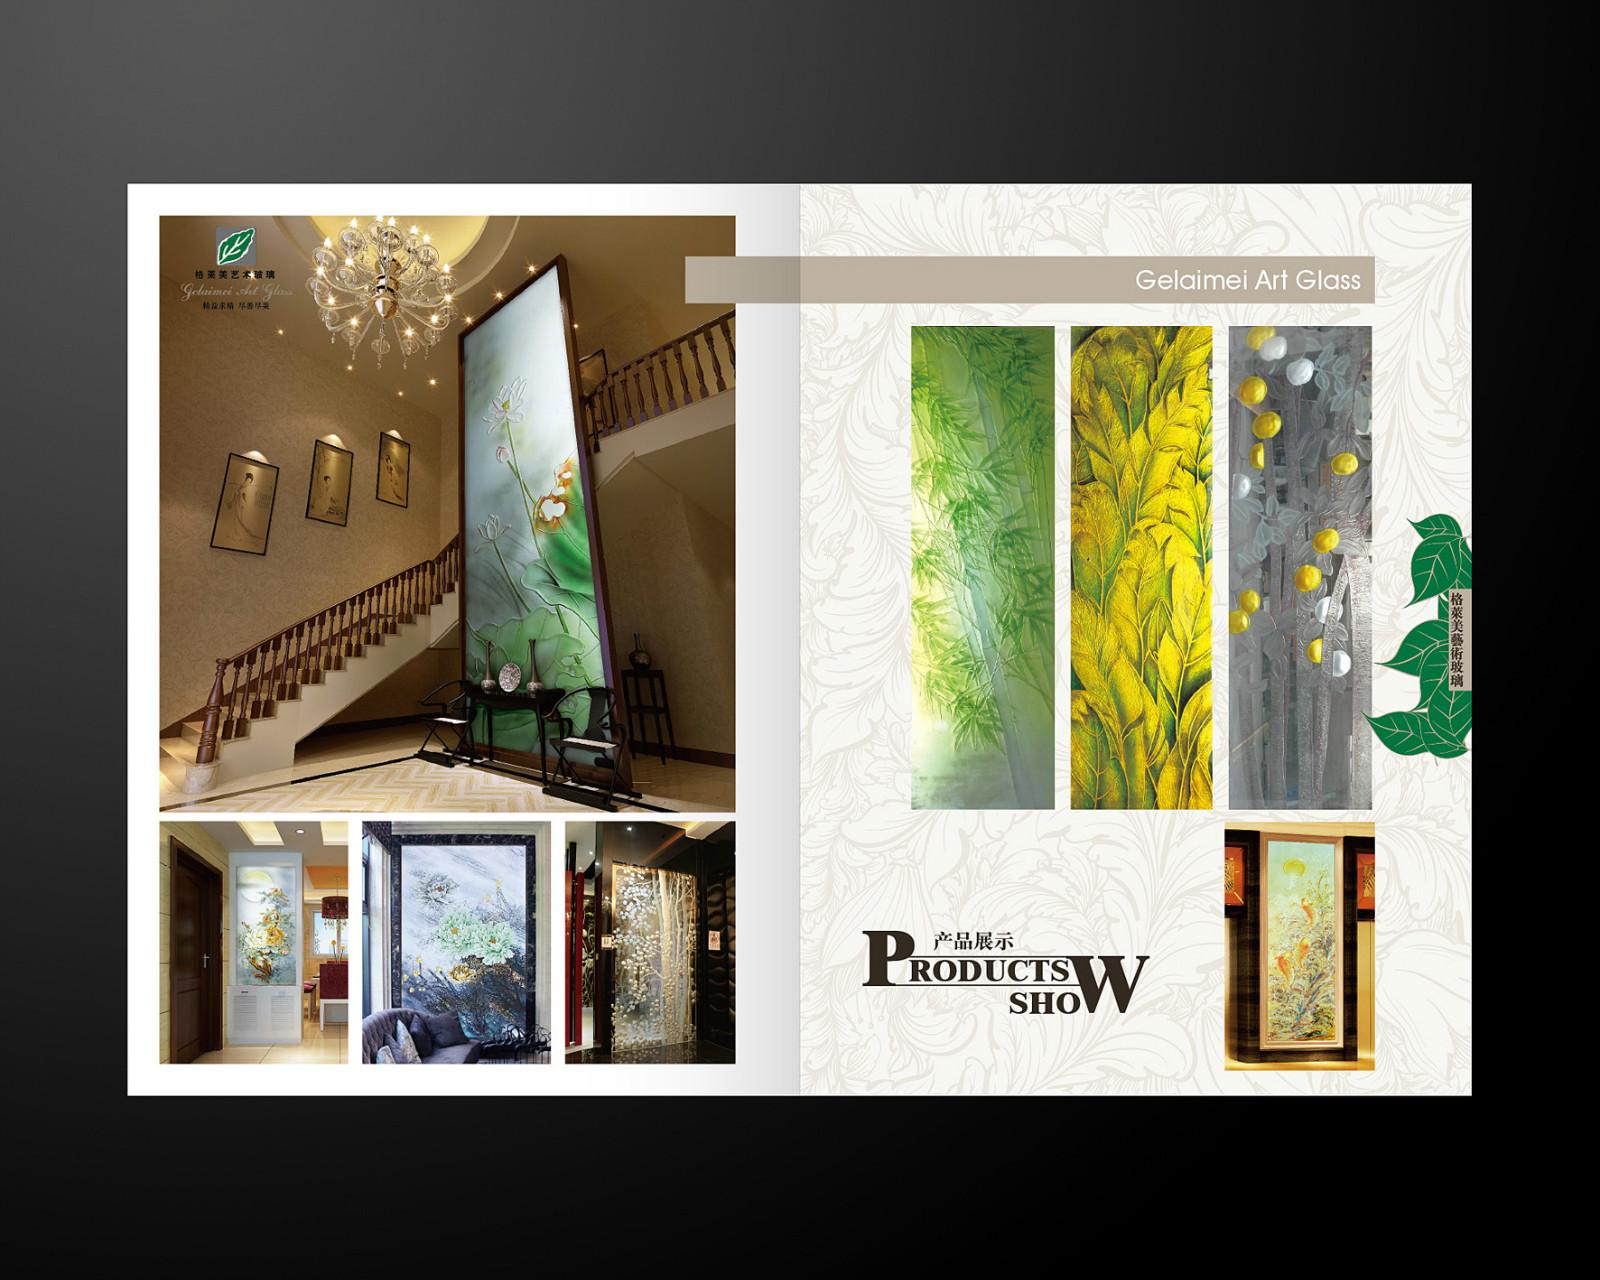 cdata 艺术玻璃影视墙 高清图片